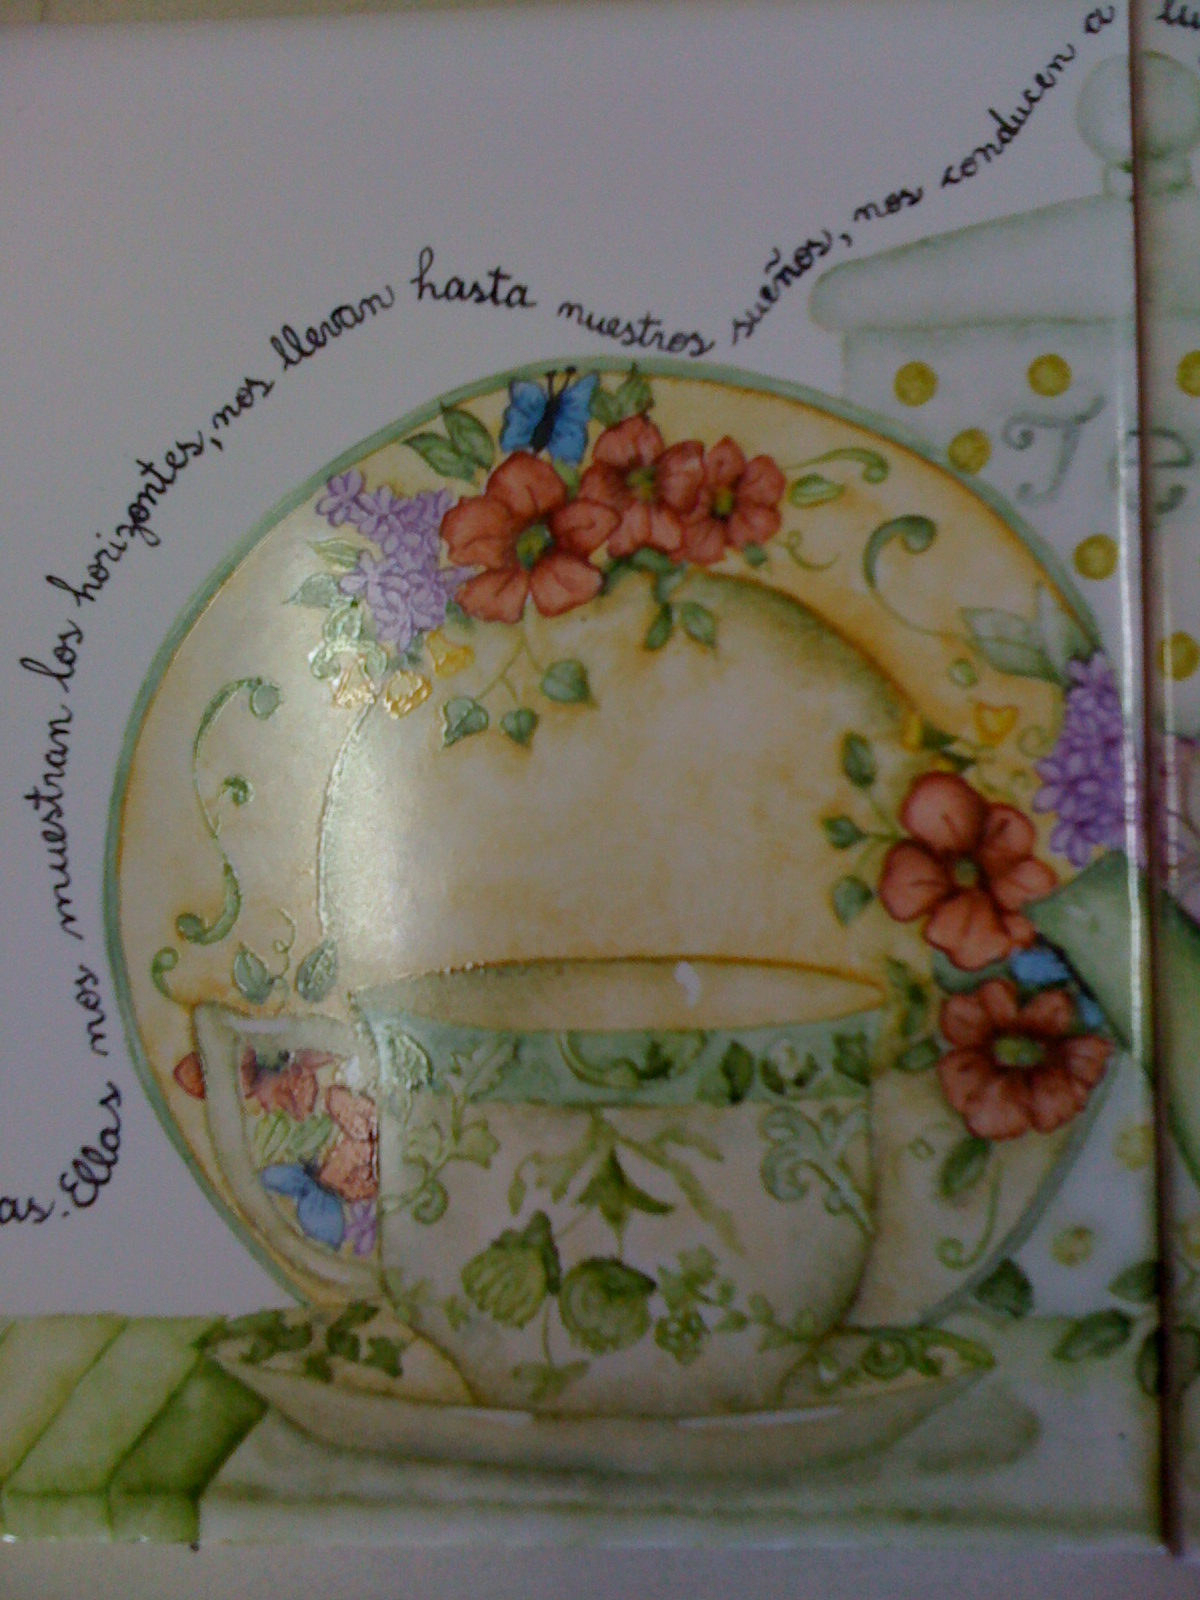 Patricia Frigeriol-Pintura en porcelana